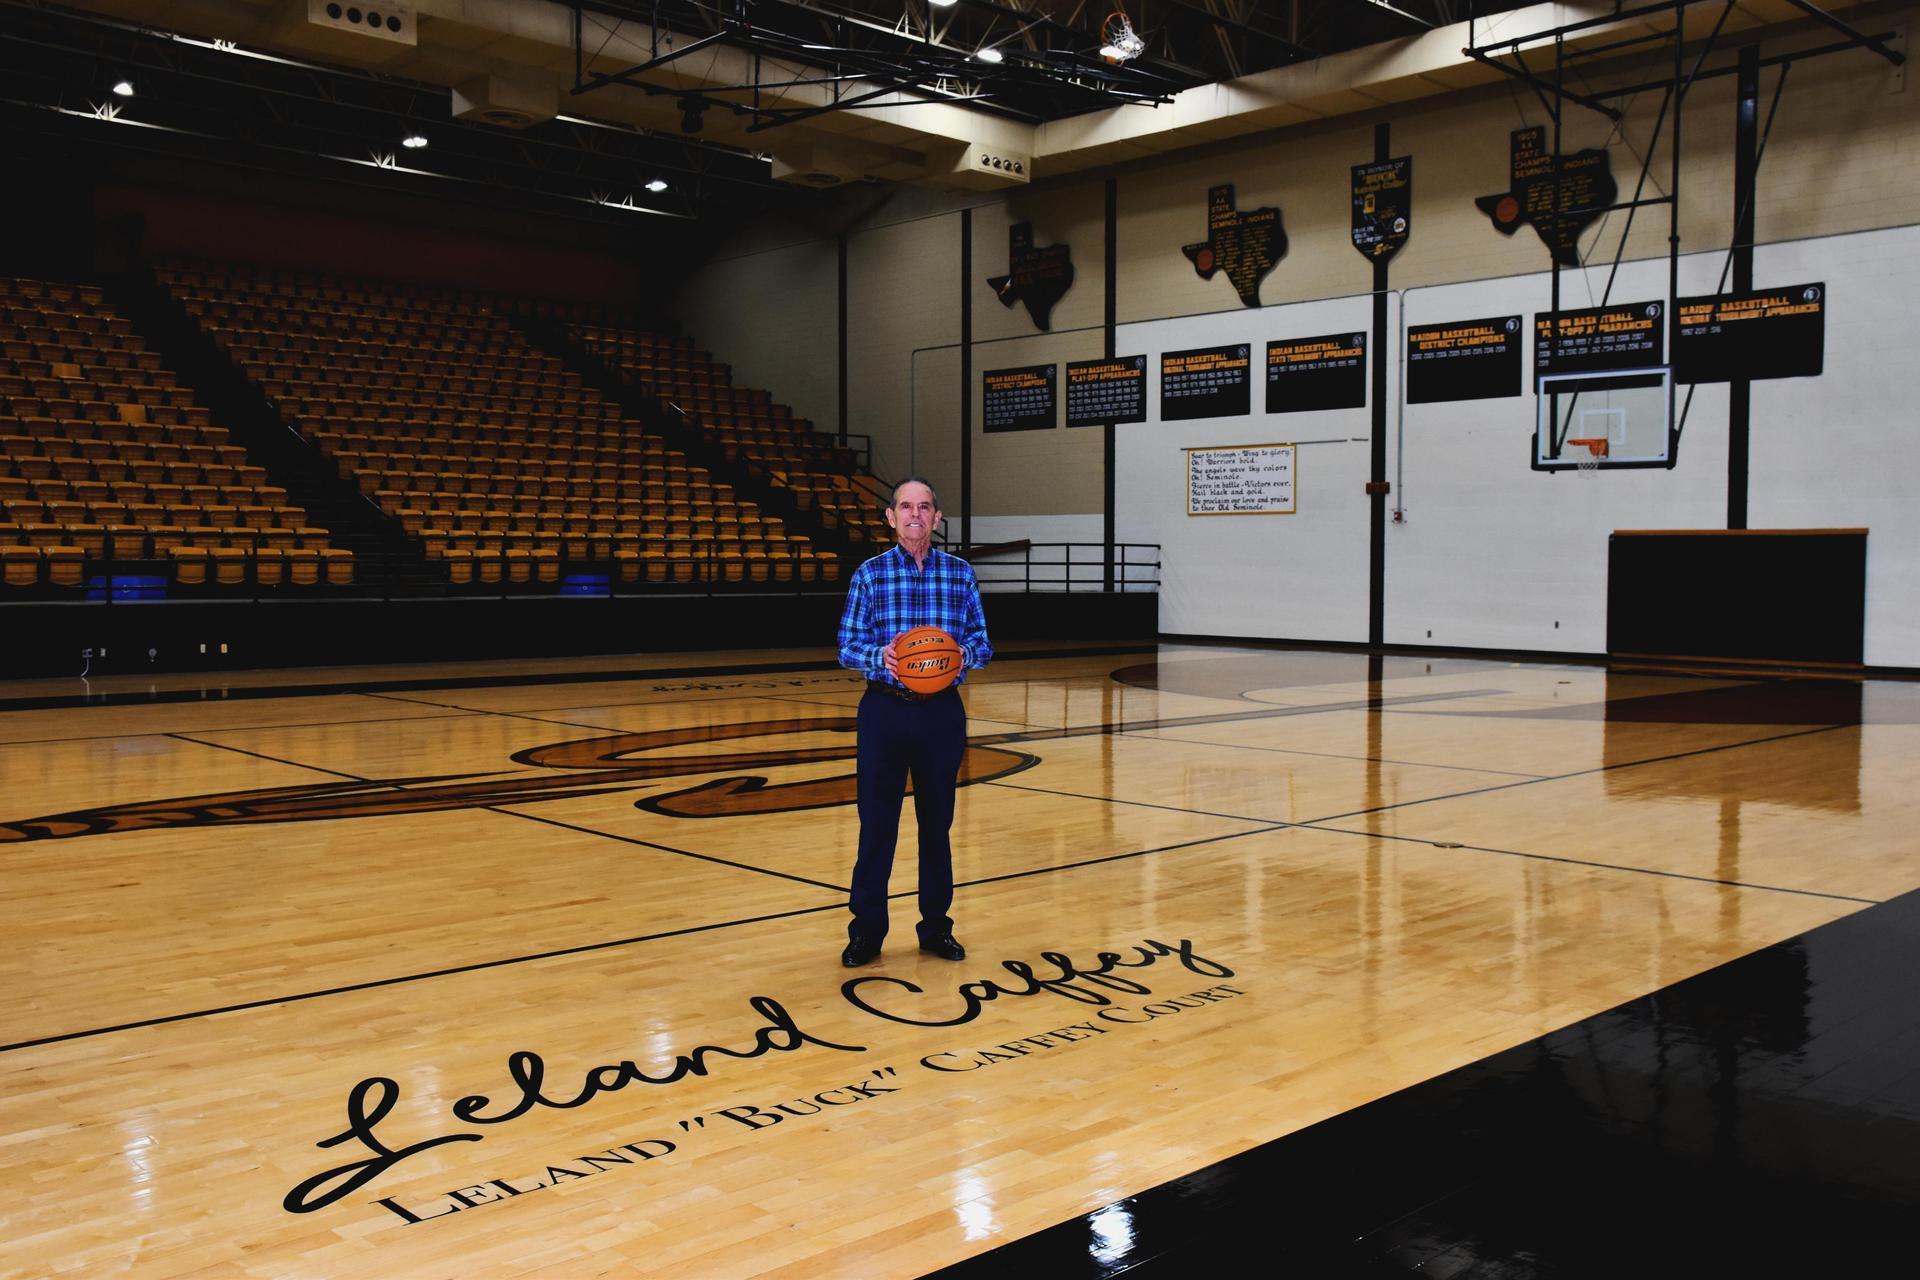 Coach Caffey on court